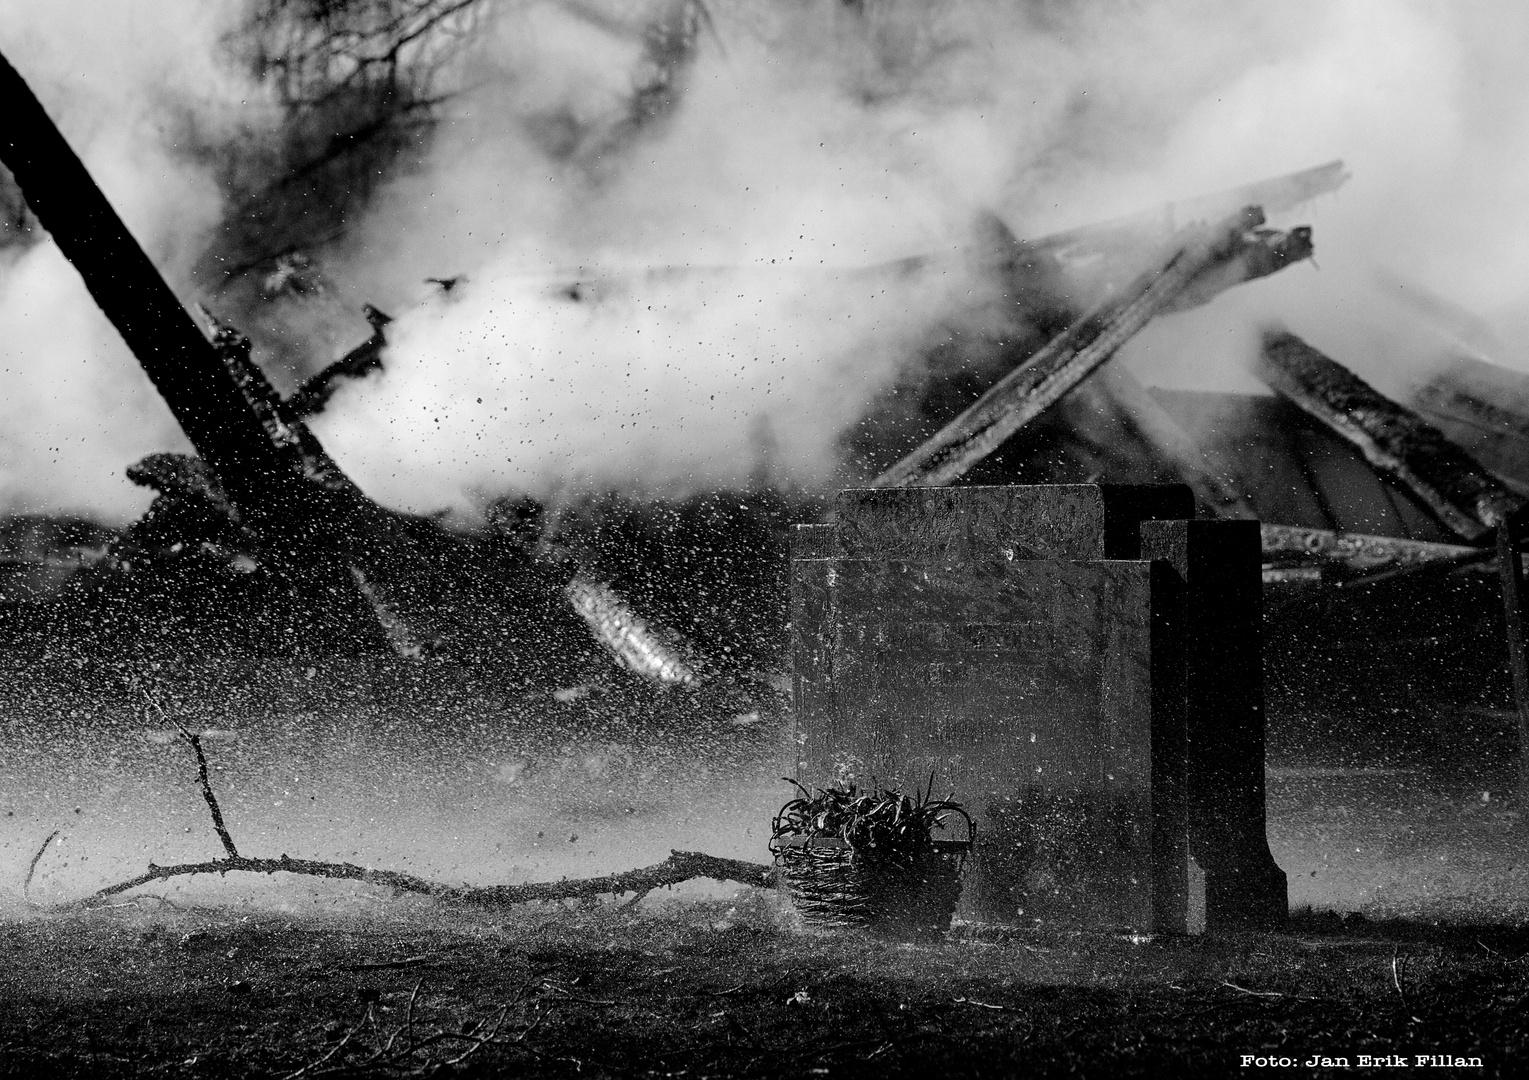 A church set on fire